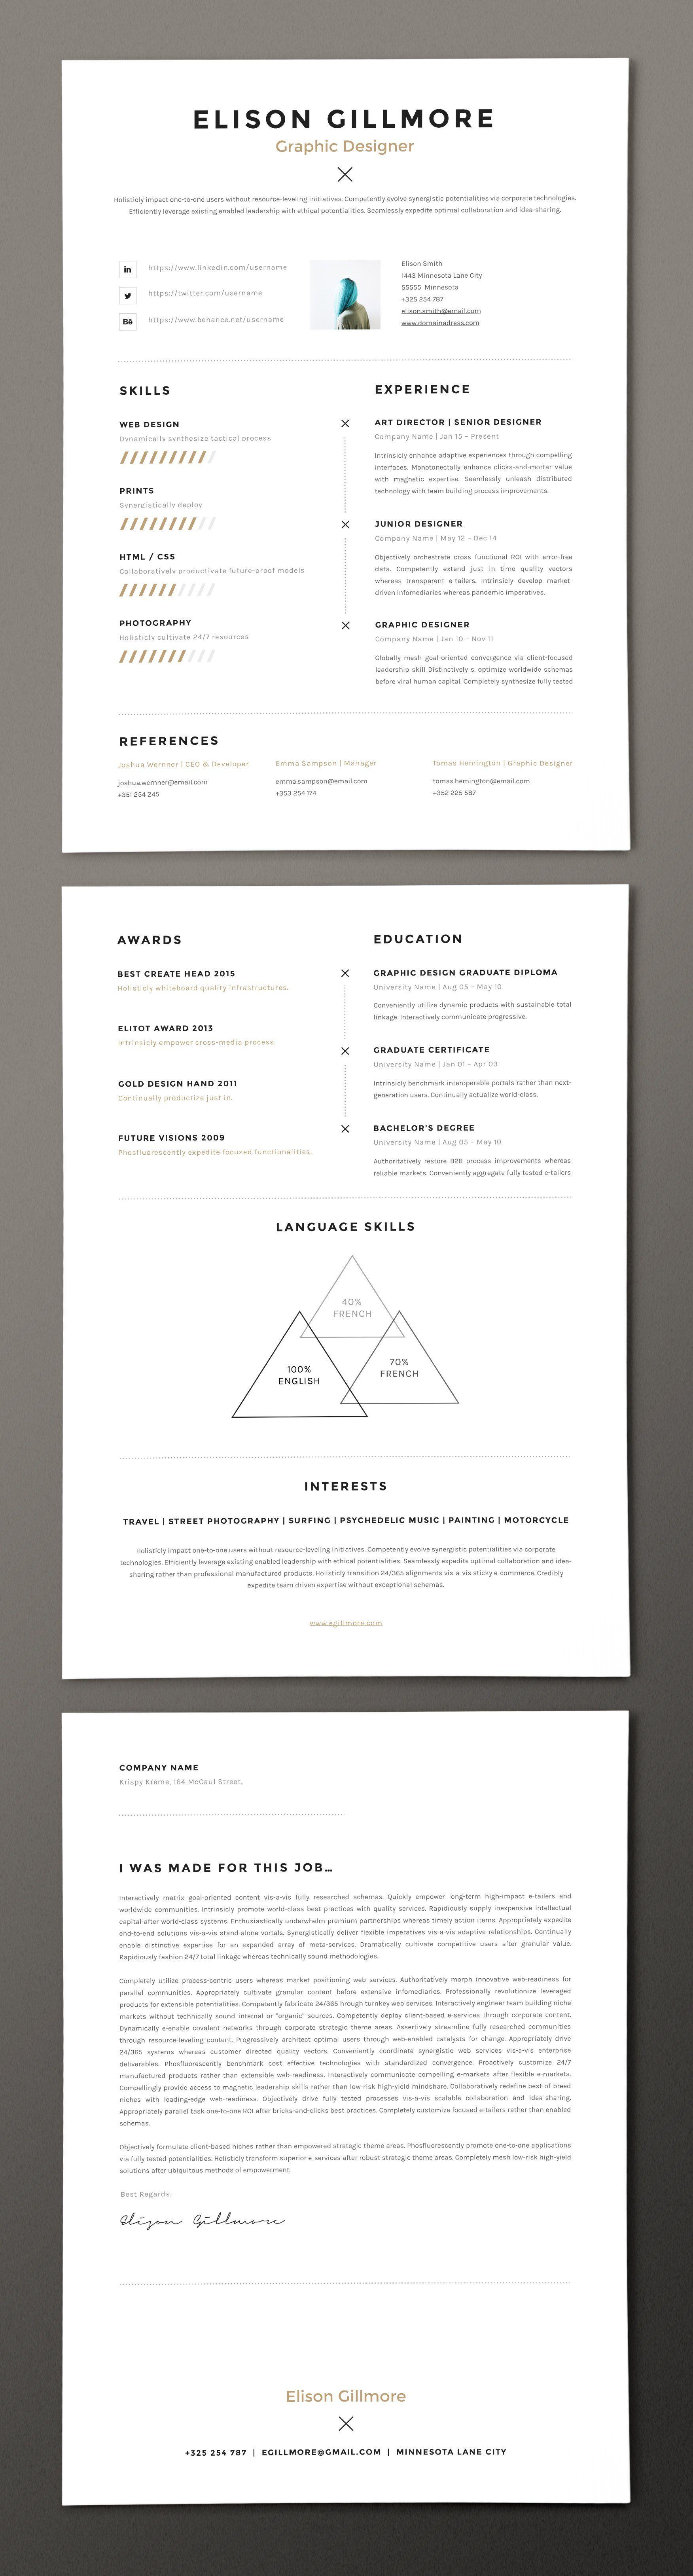 Unique Resume Cv For Pages And Word Cv Unique Mise En Page Graphic